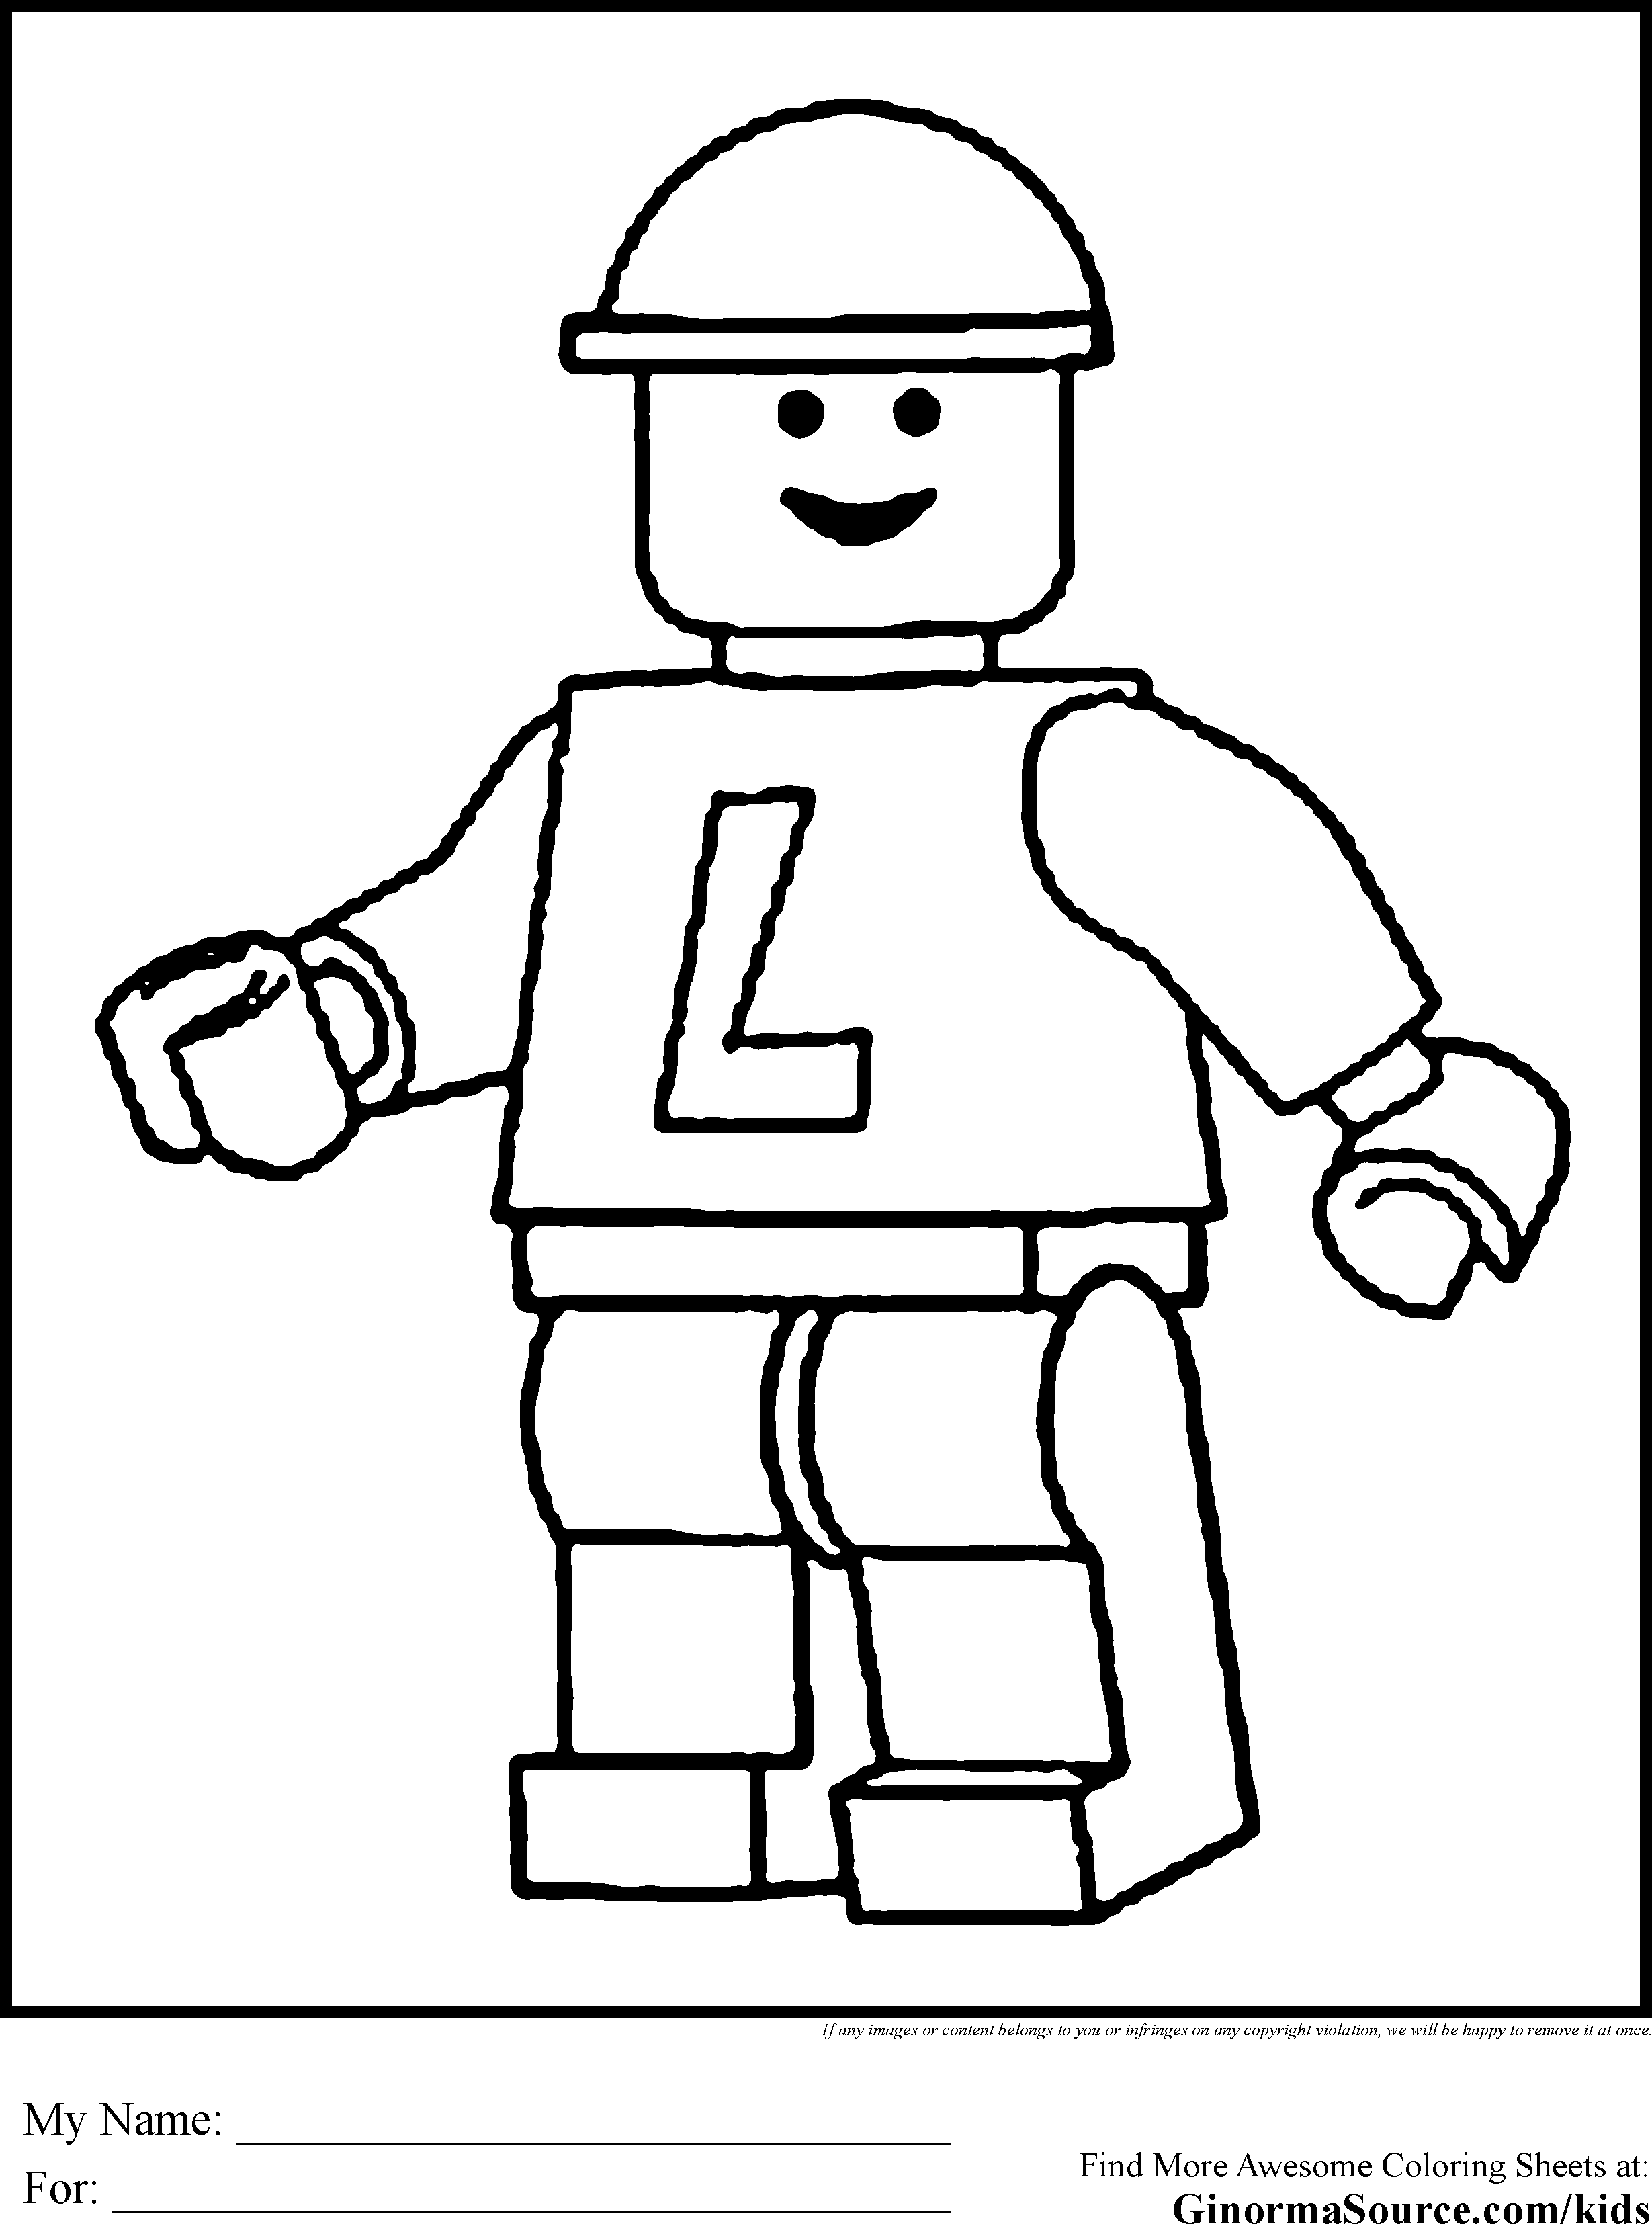 lego man coloring pages lego coloring pages legomangif 24593310 pixels lego pages man coloring lego